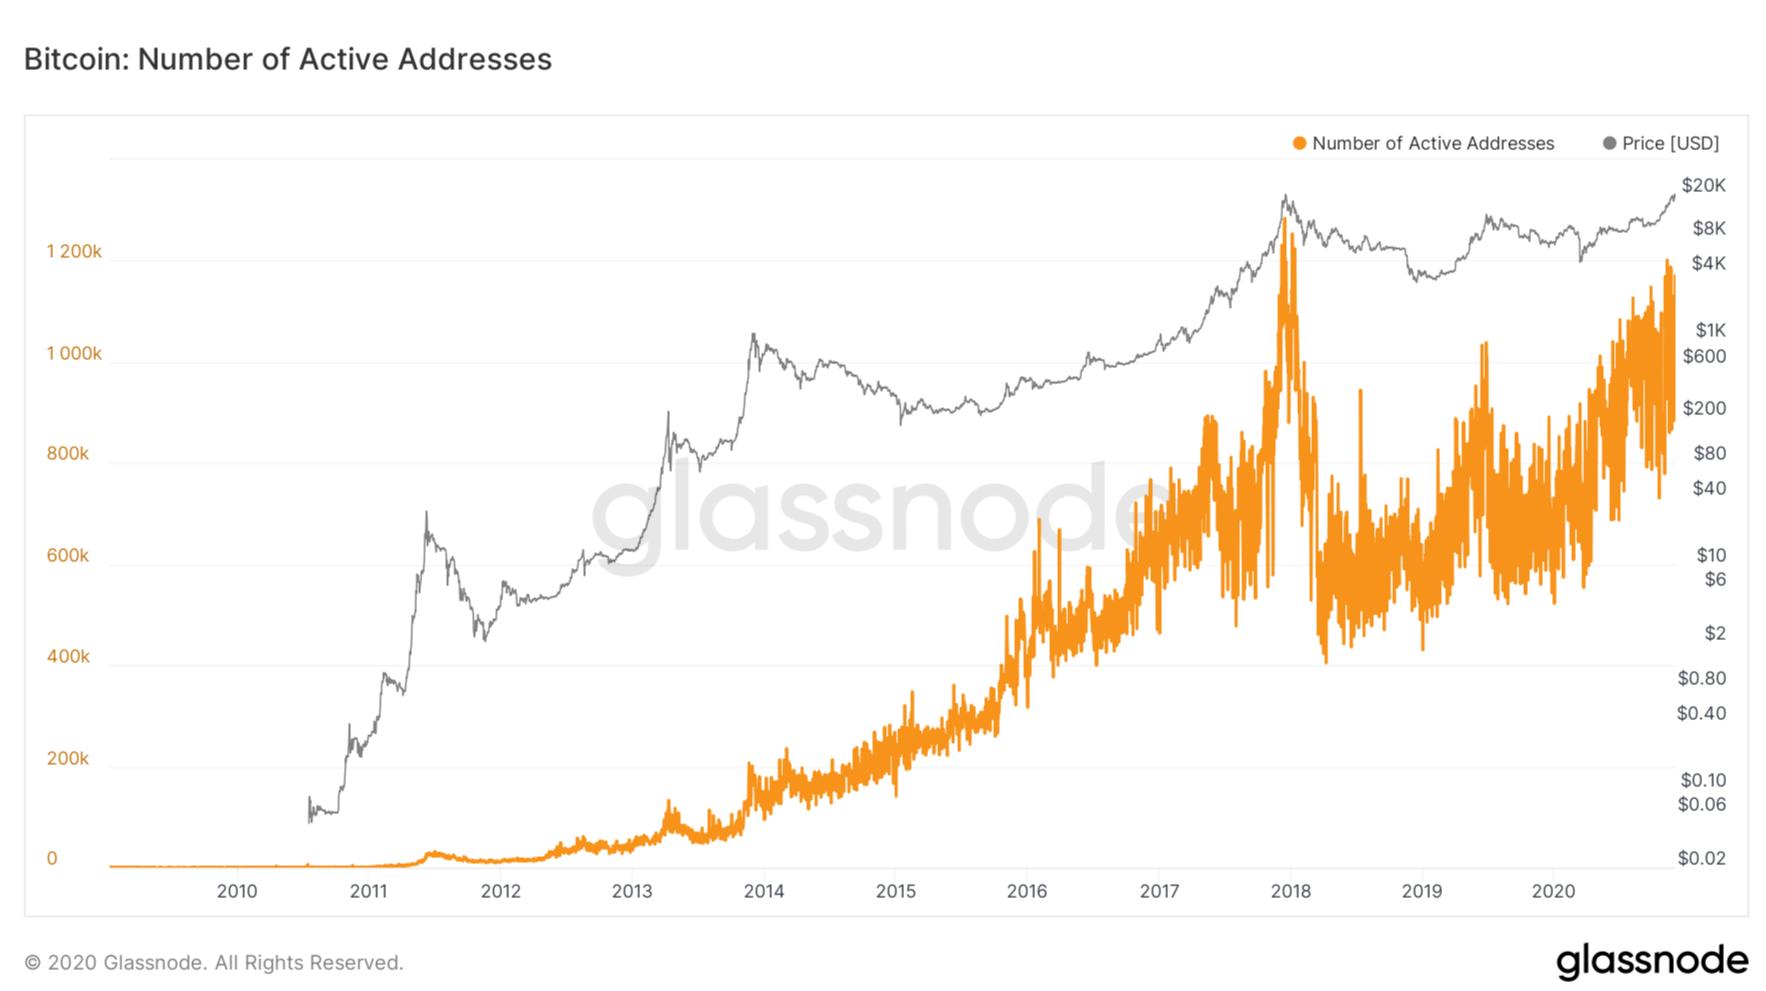 Bitcoin price vs active addresses